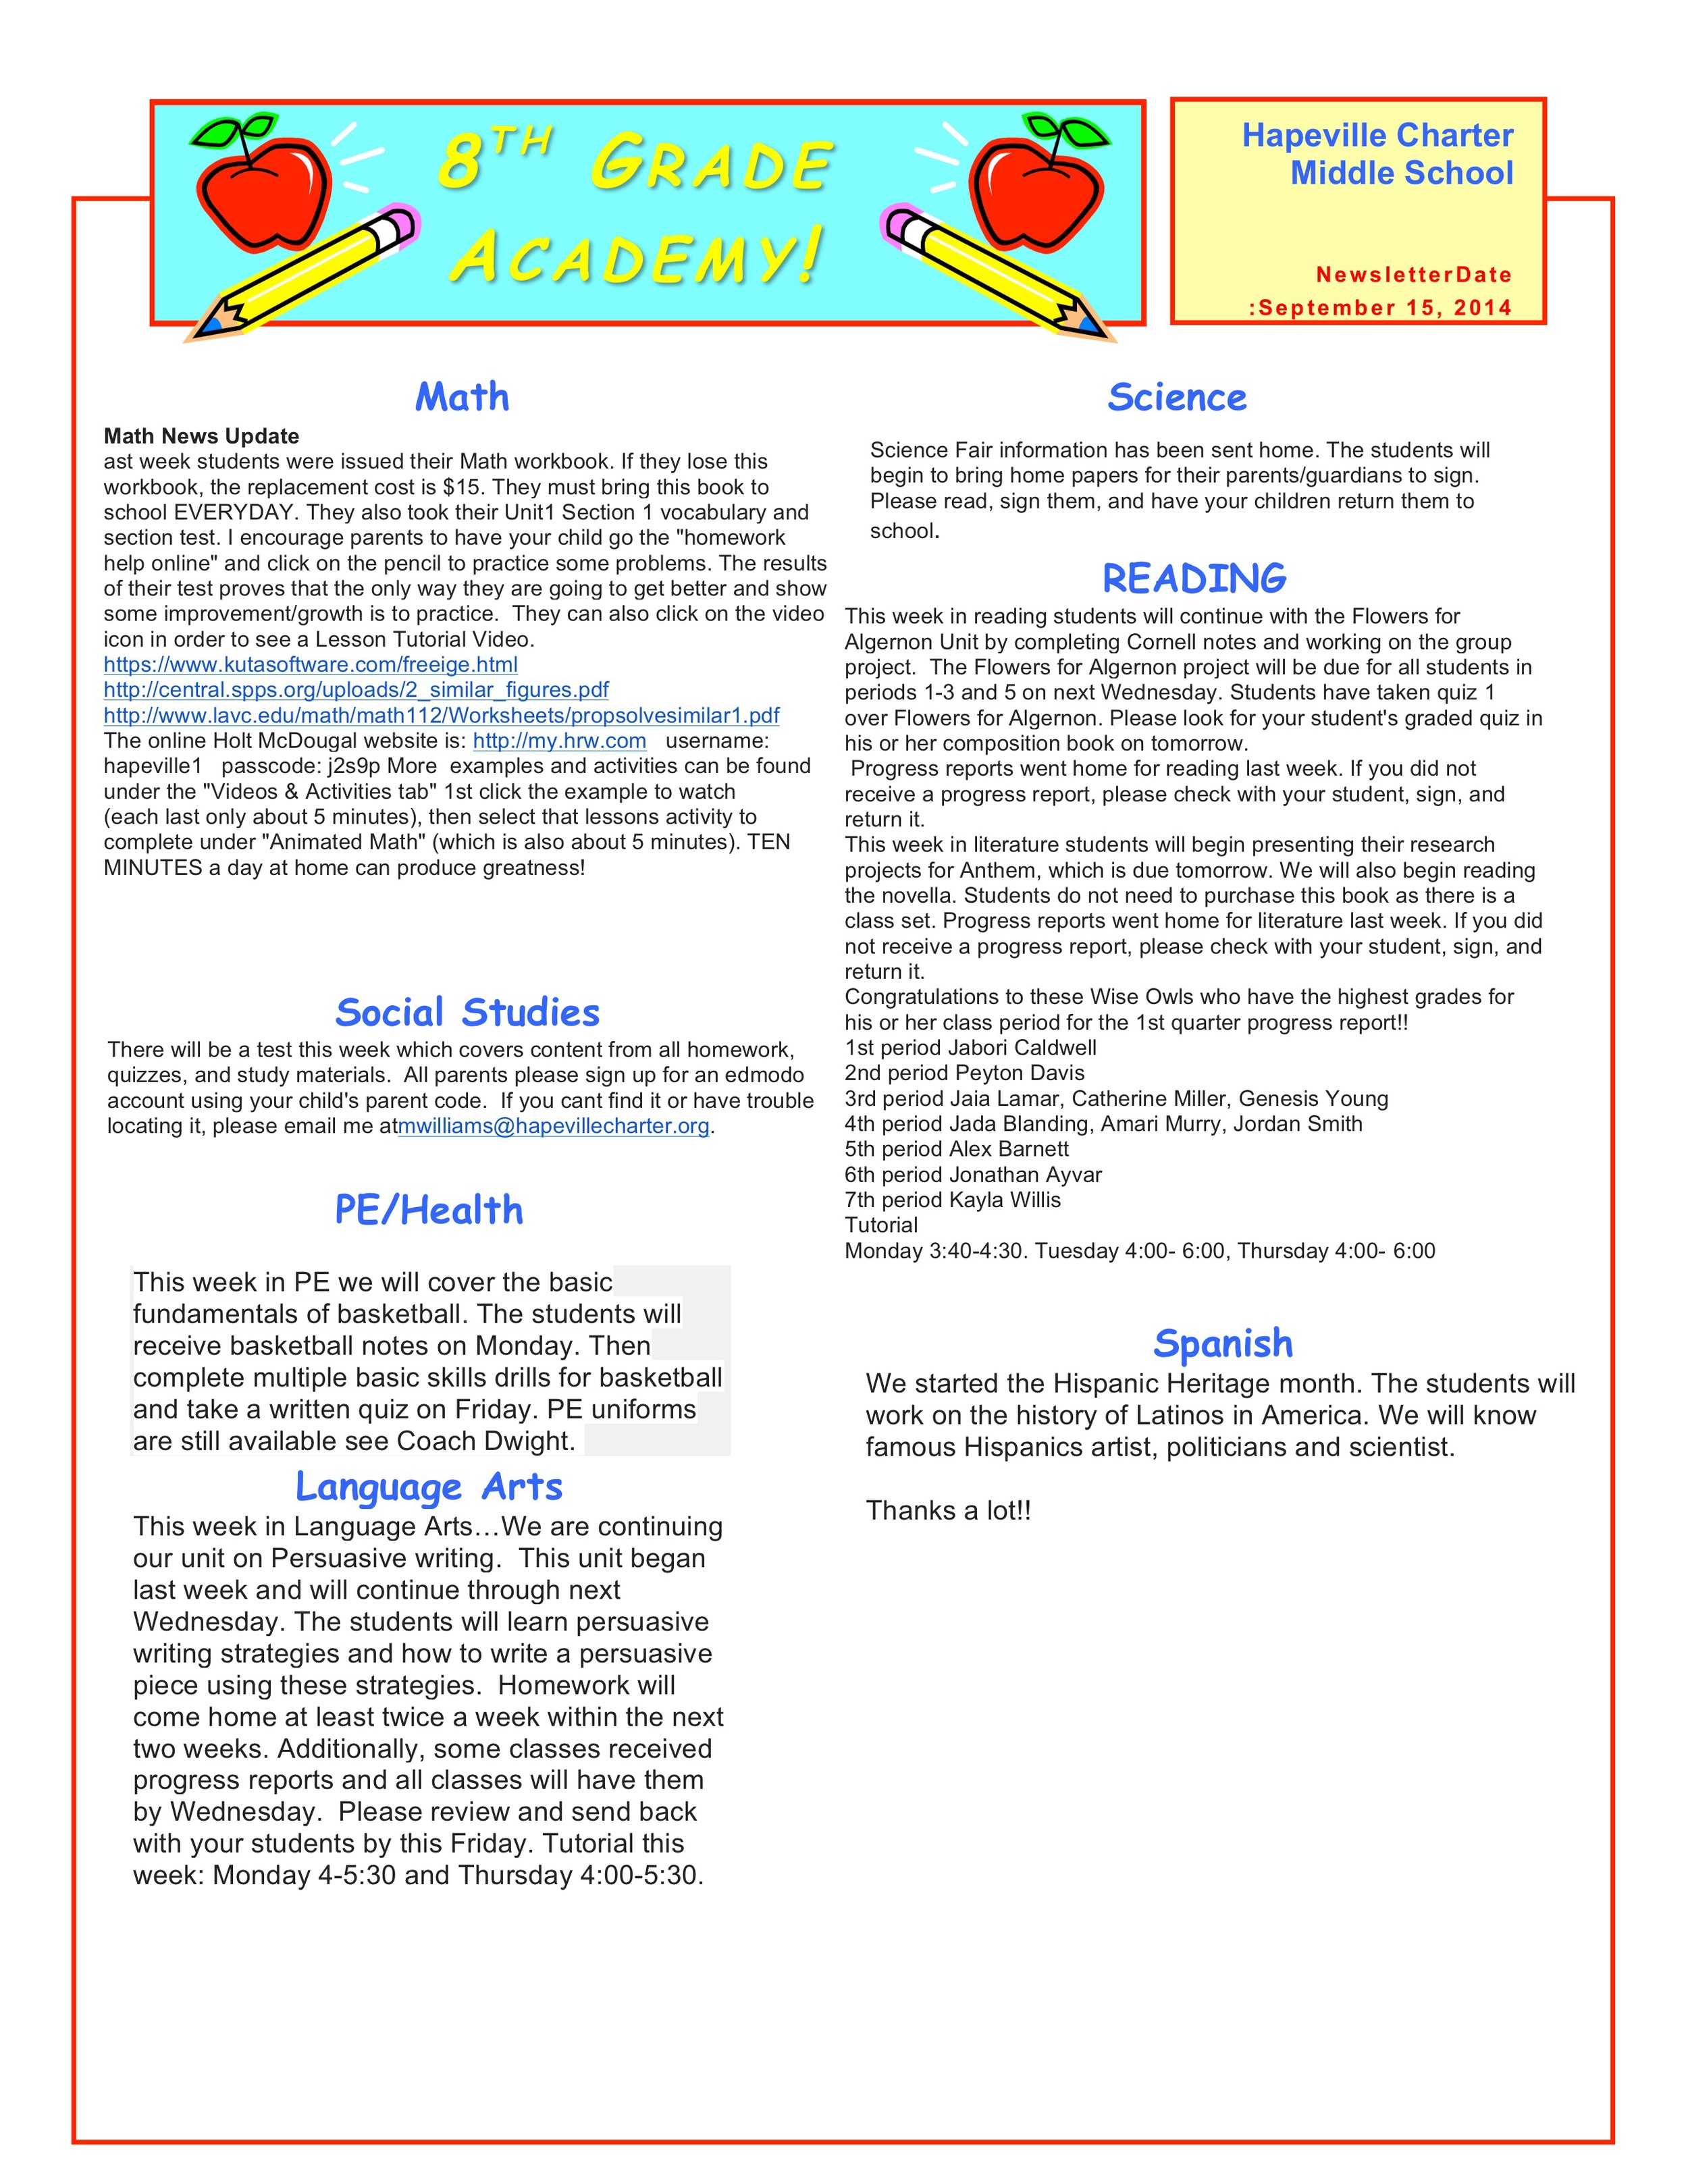 Newsletter Image8th grade 9-15-2014.jpeg